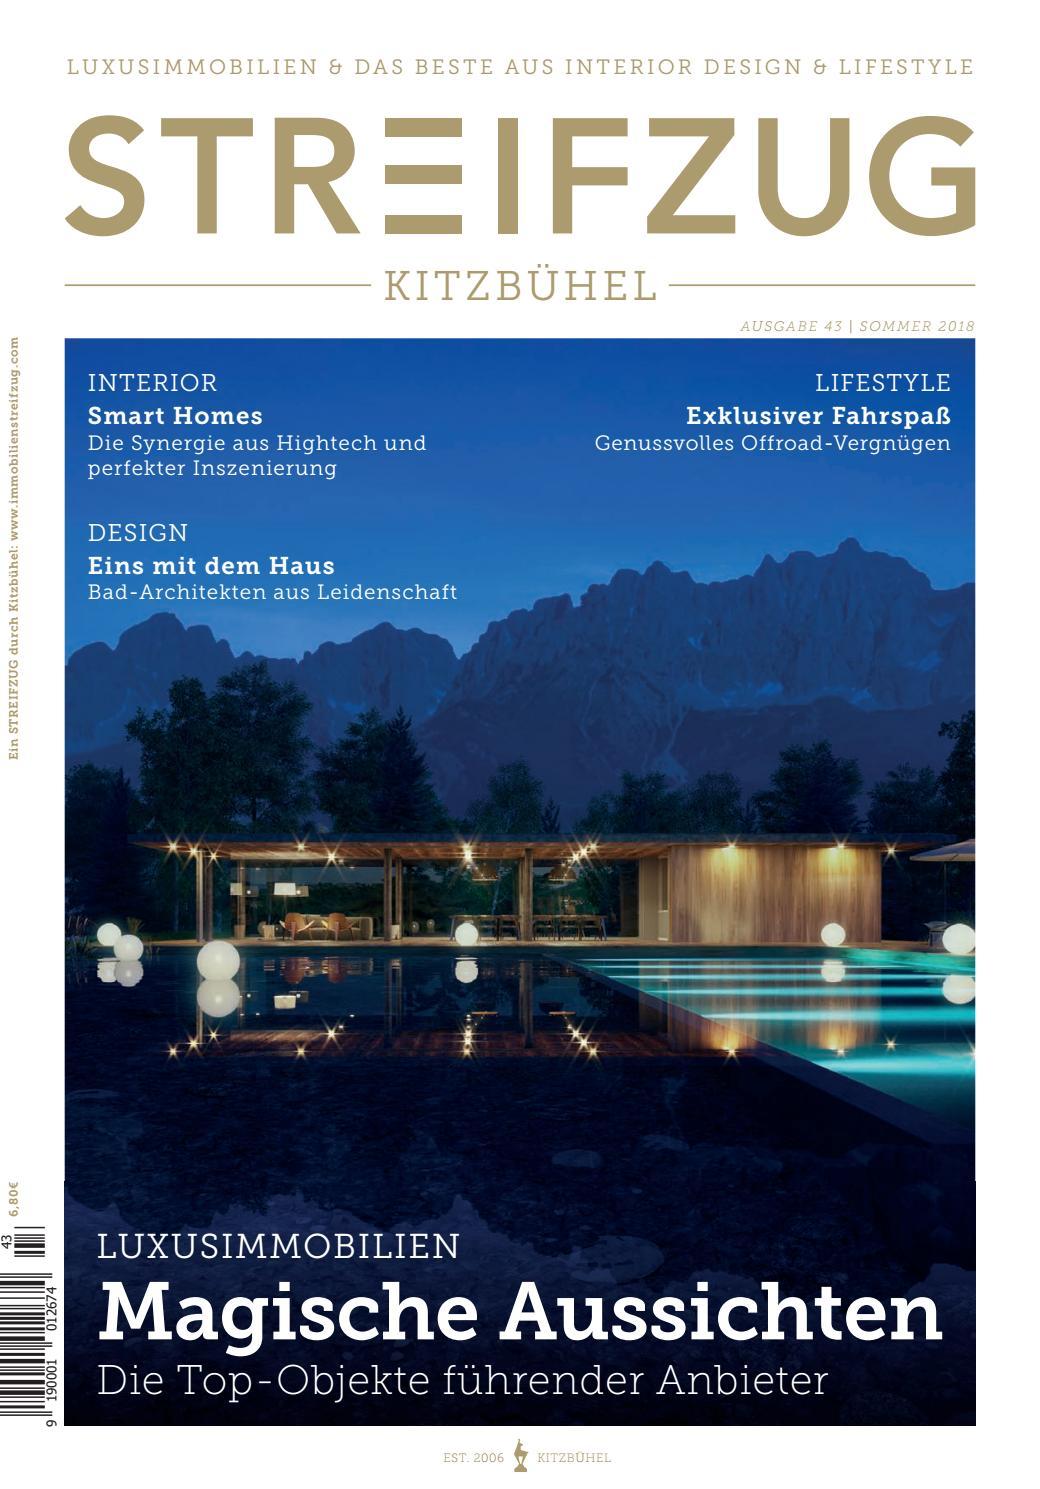 Streifzug Kitzbuhel Ausgabe 43 Sommer 2018 By Streifzug